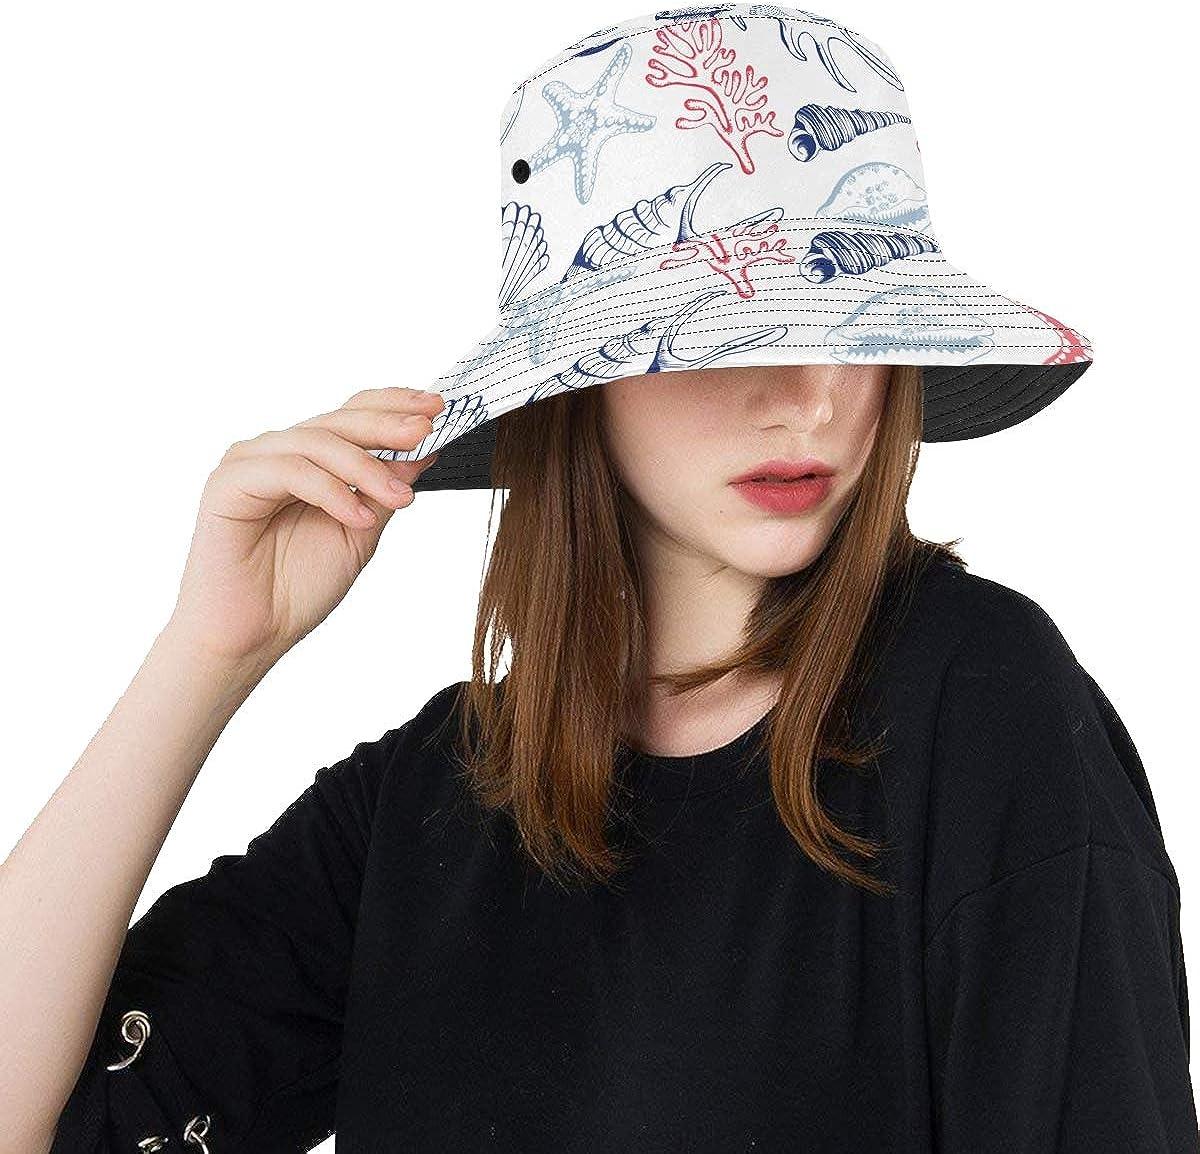 Beach Hat Black Sea Shells Little Max 85% Super sale period limited OFF Pretty Unisex S Summer Fishing